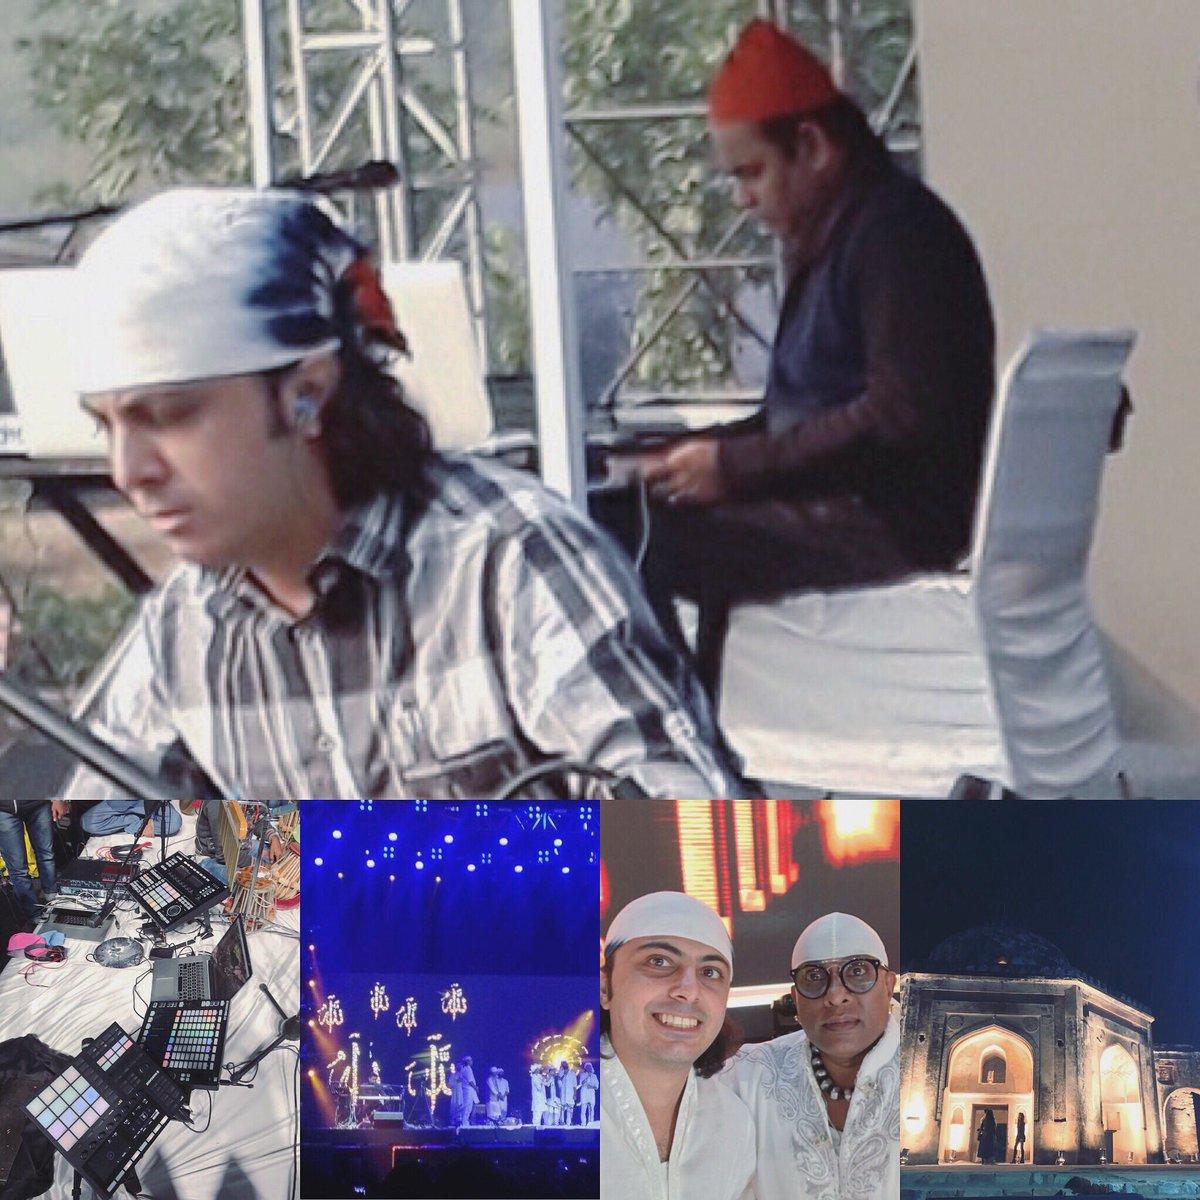 It was a memorable concert last night @Sufi Route, Qutb Minar, Delhi.   Thanks to ARRahman sir, @KMMC_Chennai &amp; BTOS.  #live #music #sufi #technology #grand #rehearsal#devotional #spiritual #vibes #ARRahman #ARR #KM #KMMC #SUFI #ENSEMBLE #BTOS #ProMusicals #Musician #Music #India<br>http://pic.twitter.com/DEB4VvvB5t